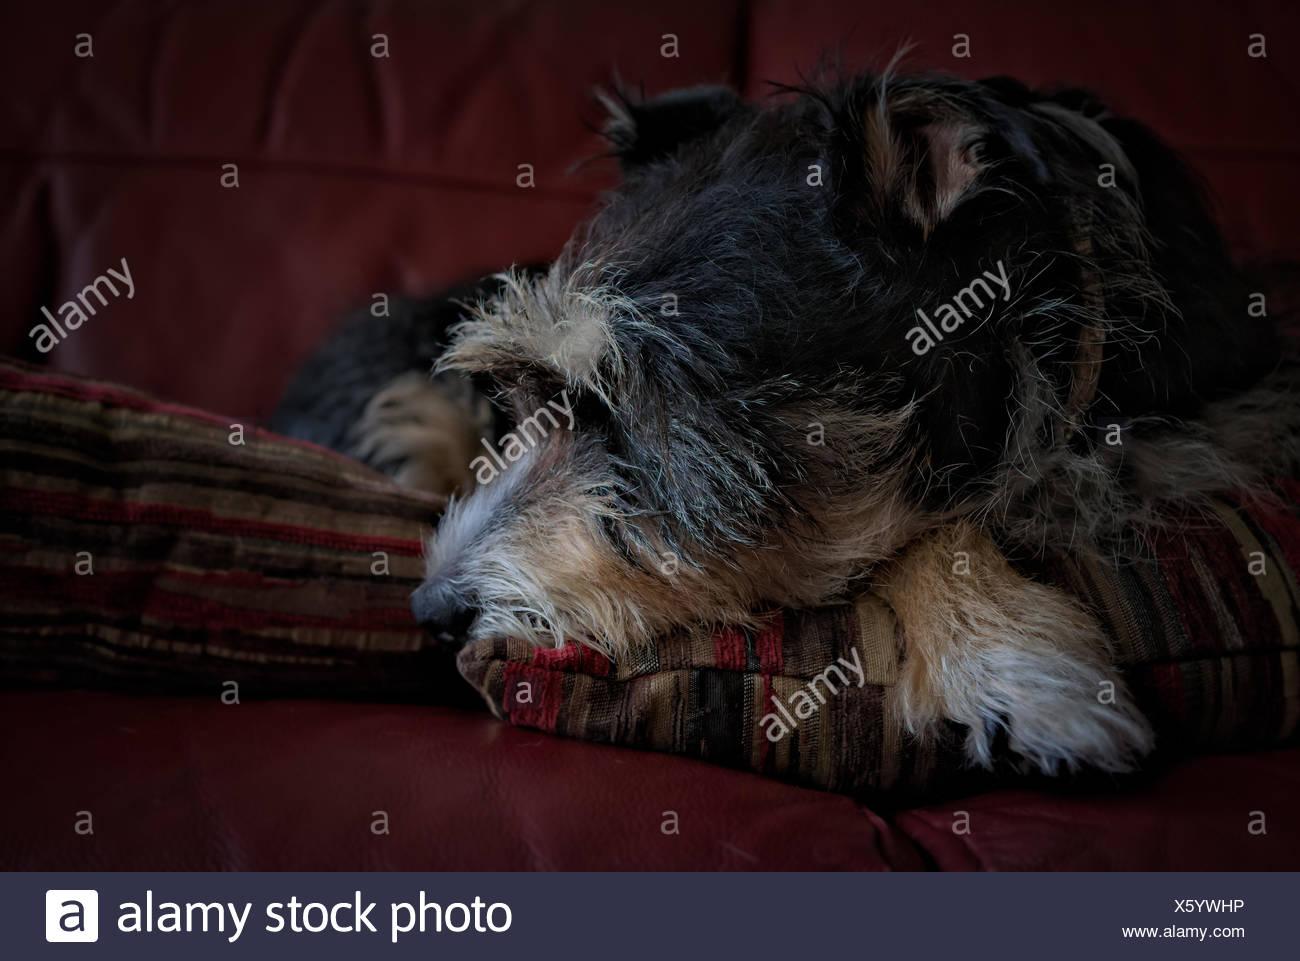 Dog Sleeping On Sofa - Stock Image